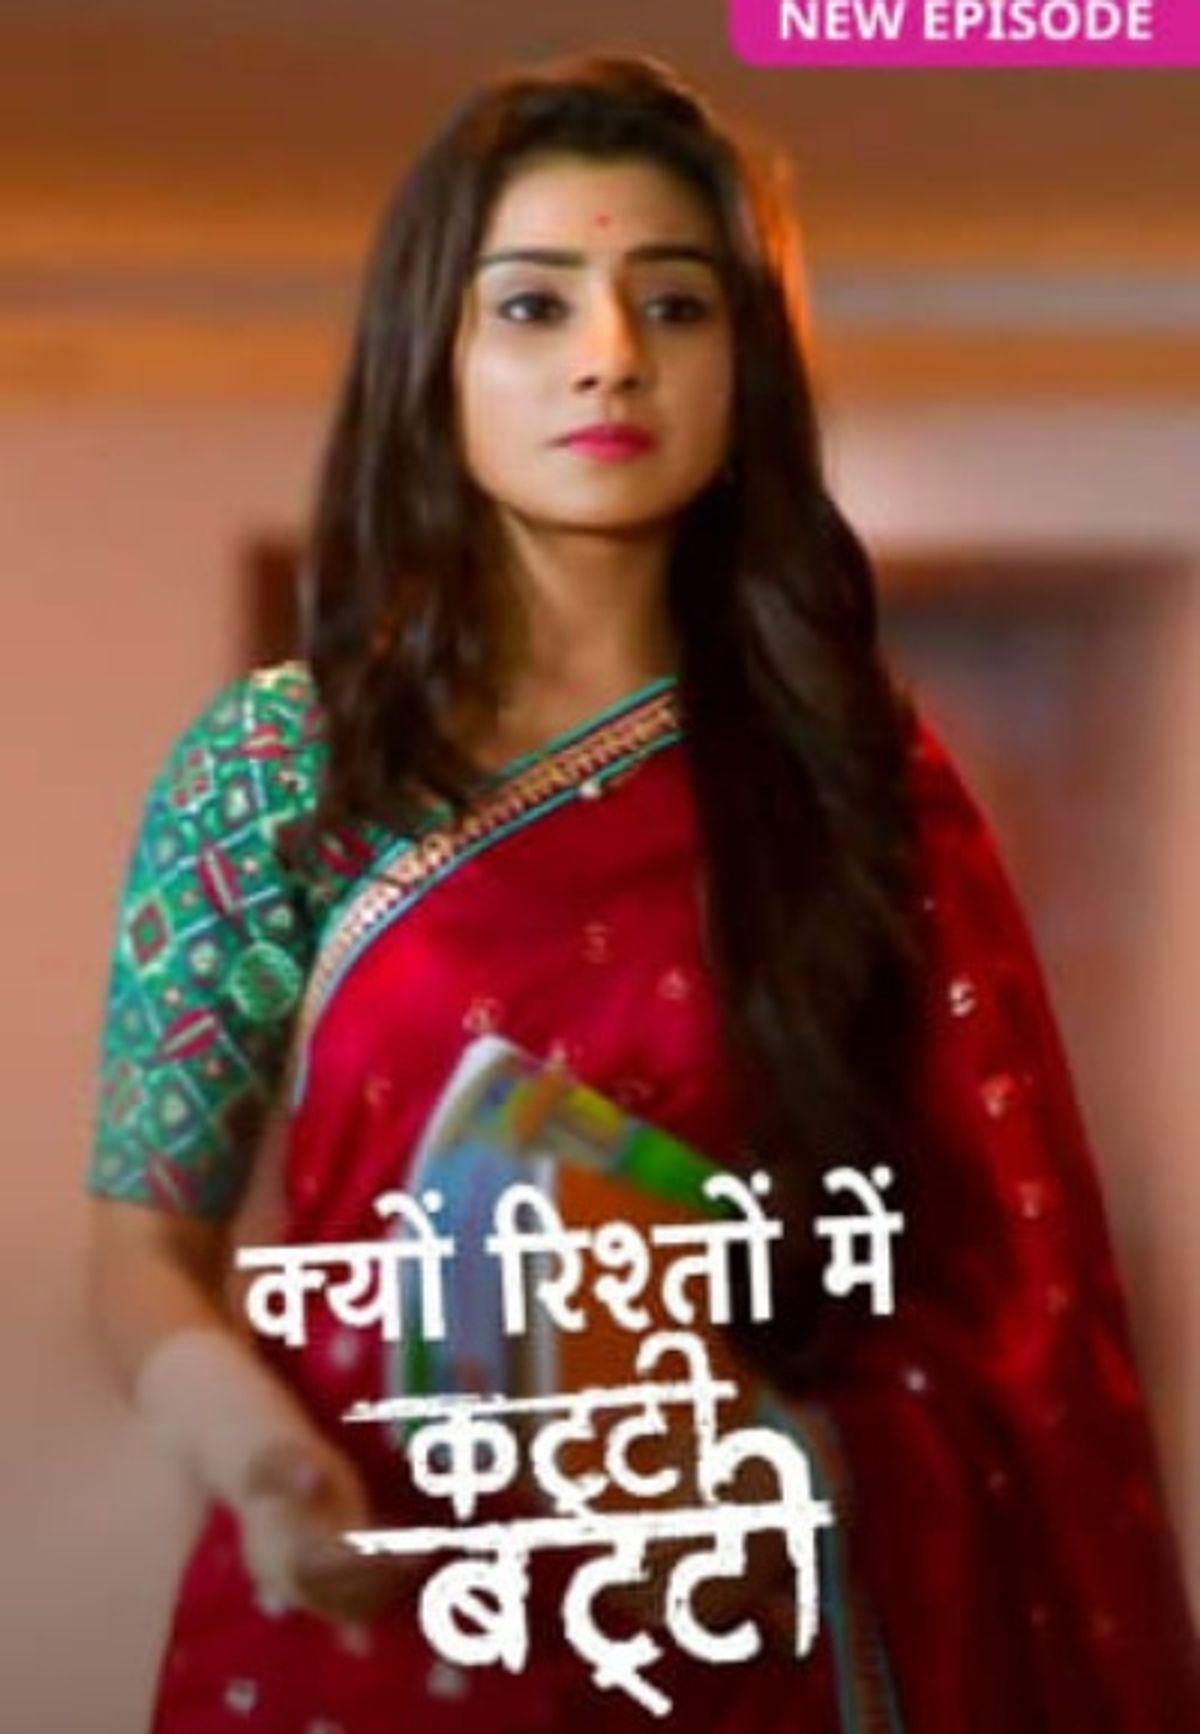 Pratyaksh Panwar Best Movies, TV Shows and Web Series List